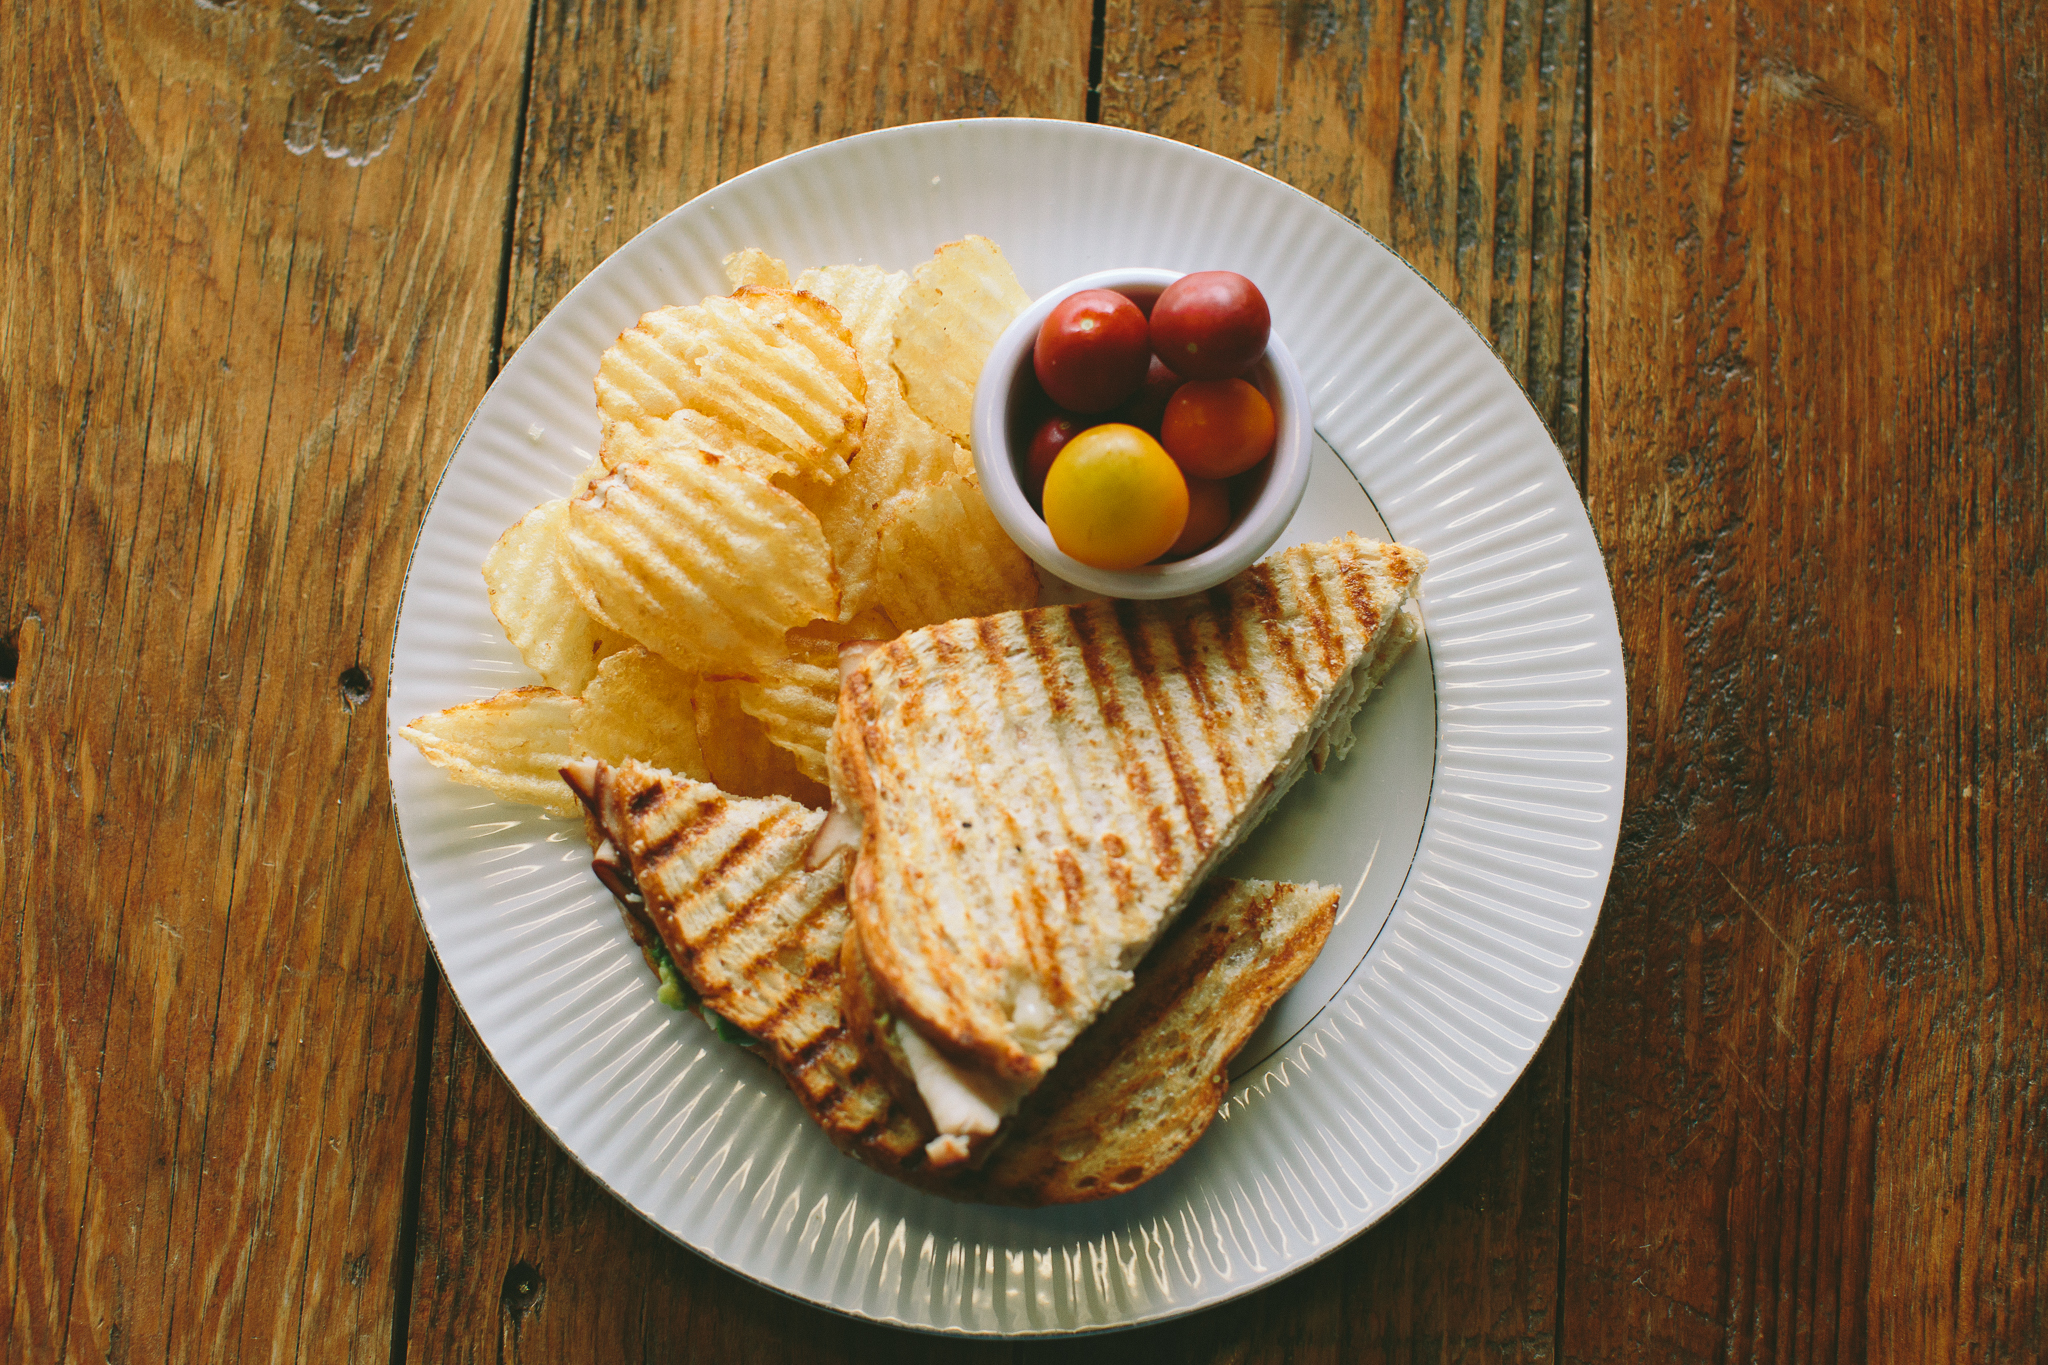 Damascus Sandwich